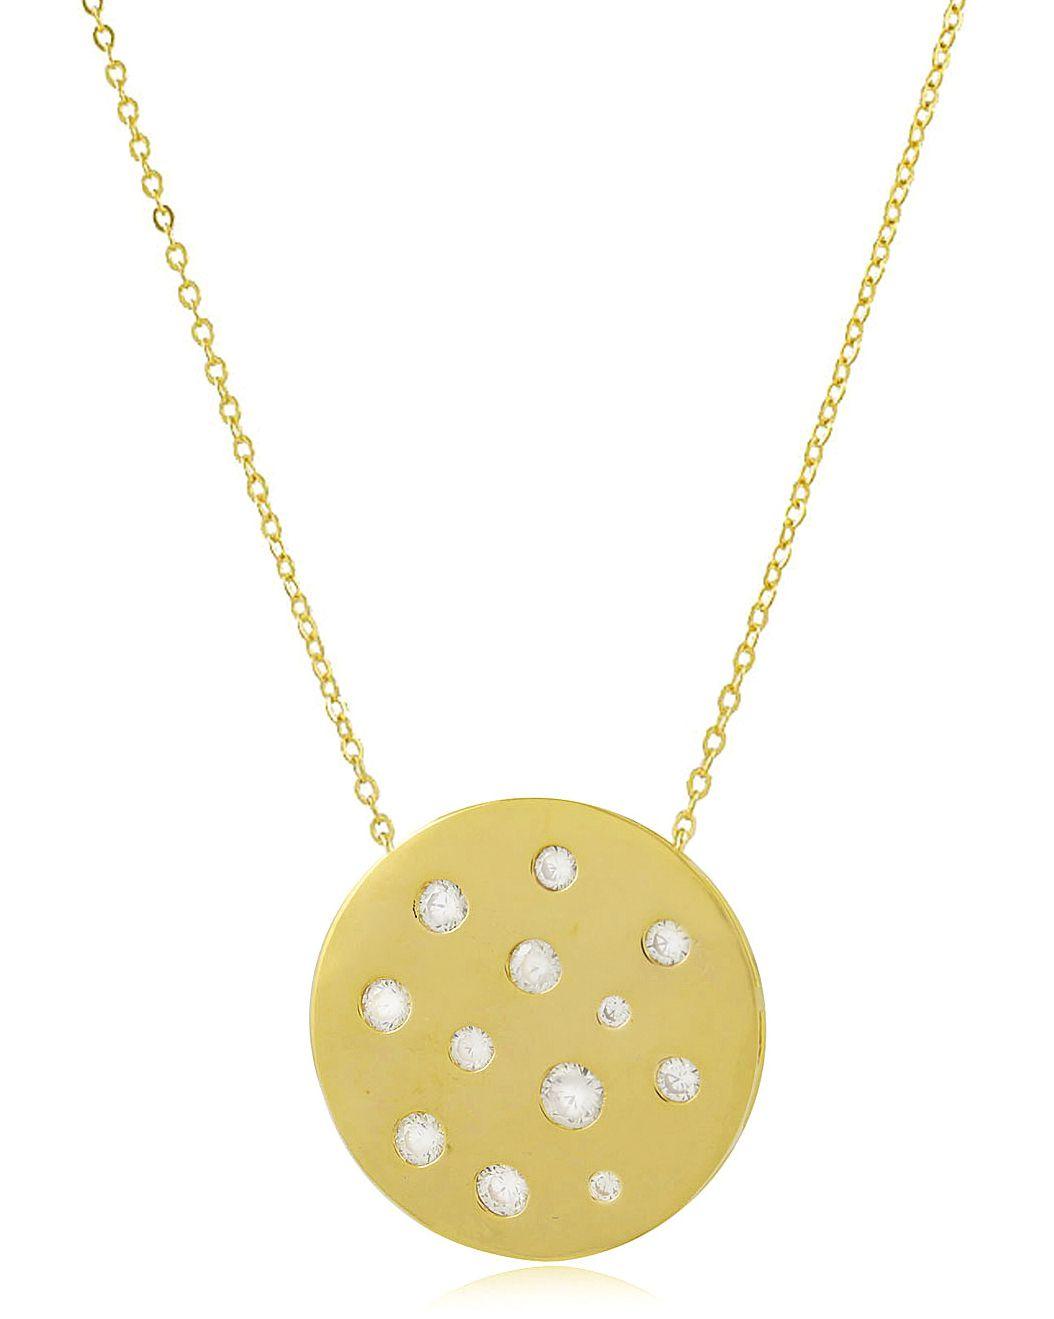 Colar Círculo Luxo Zircônia Dourado Duquesa Semi joias